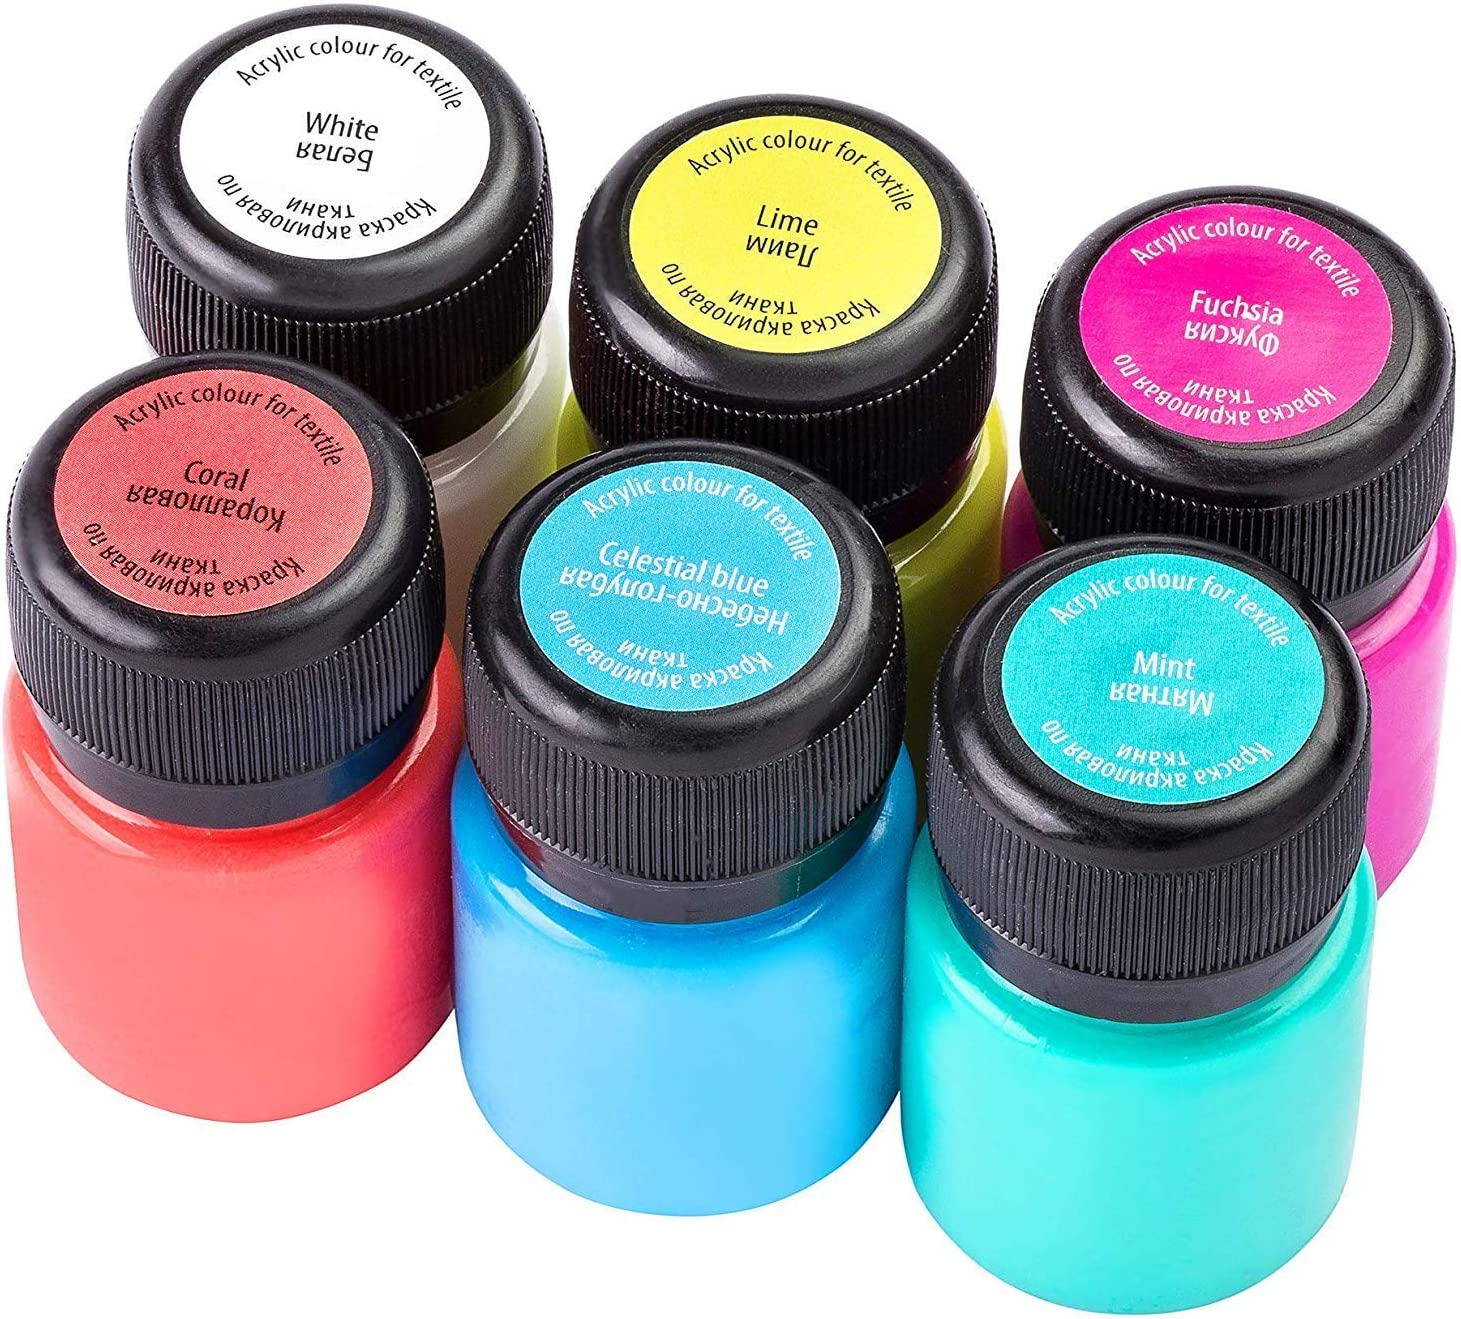 Pintura textil acrílica de alta calidad – a elegir:6 o 12 colores cada 20 ml - colores de tela lavables - Nevskaya Palitra (juego de 6)